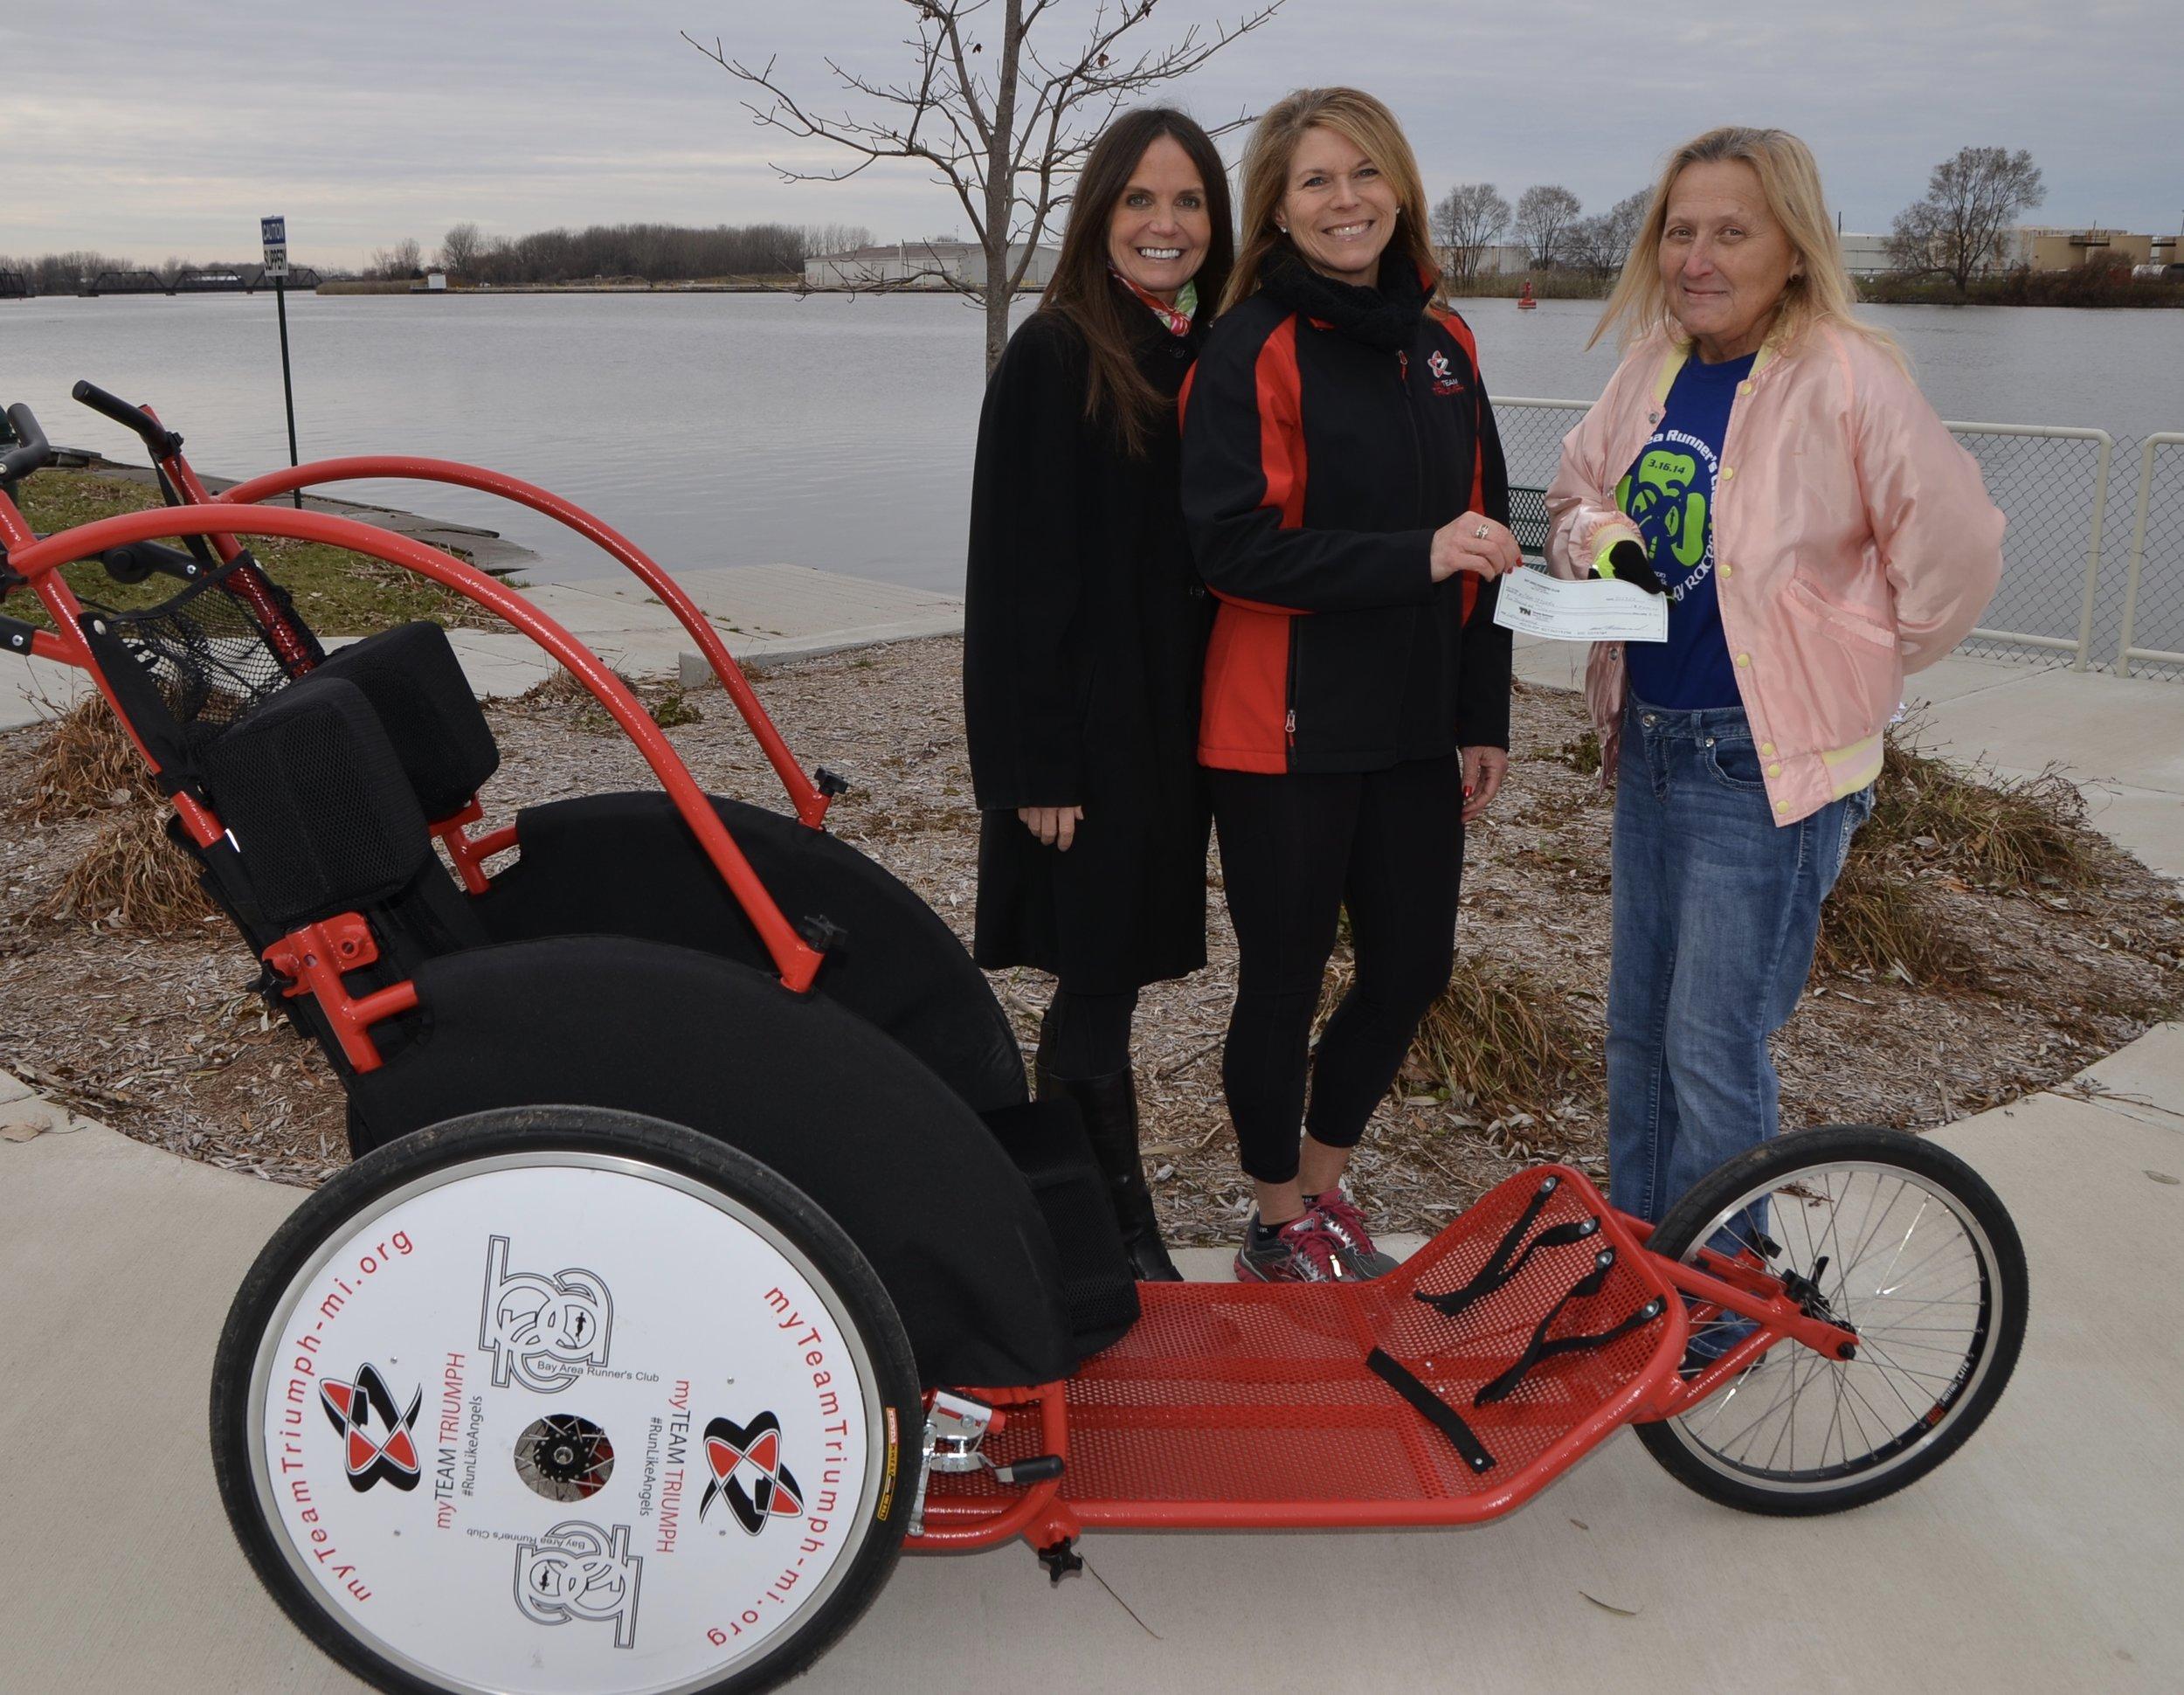 Bridget Staffileno - CFCU (St Pat Race Presenting Sponsor), Deb Militello - myTeamTriumph and Linda Flues - BARC